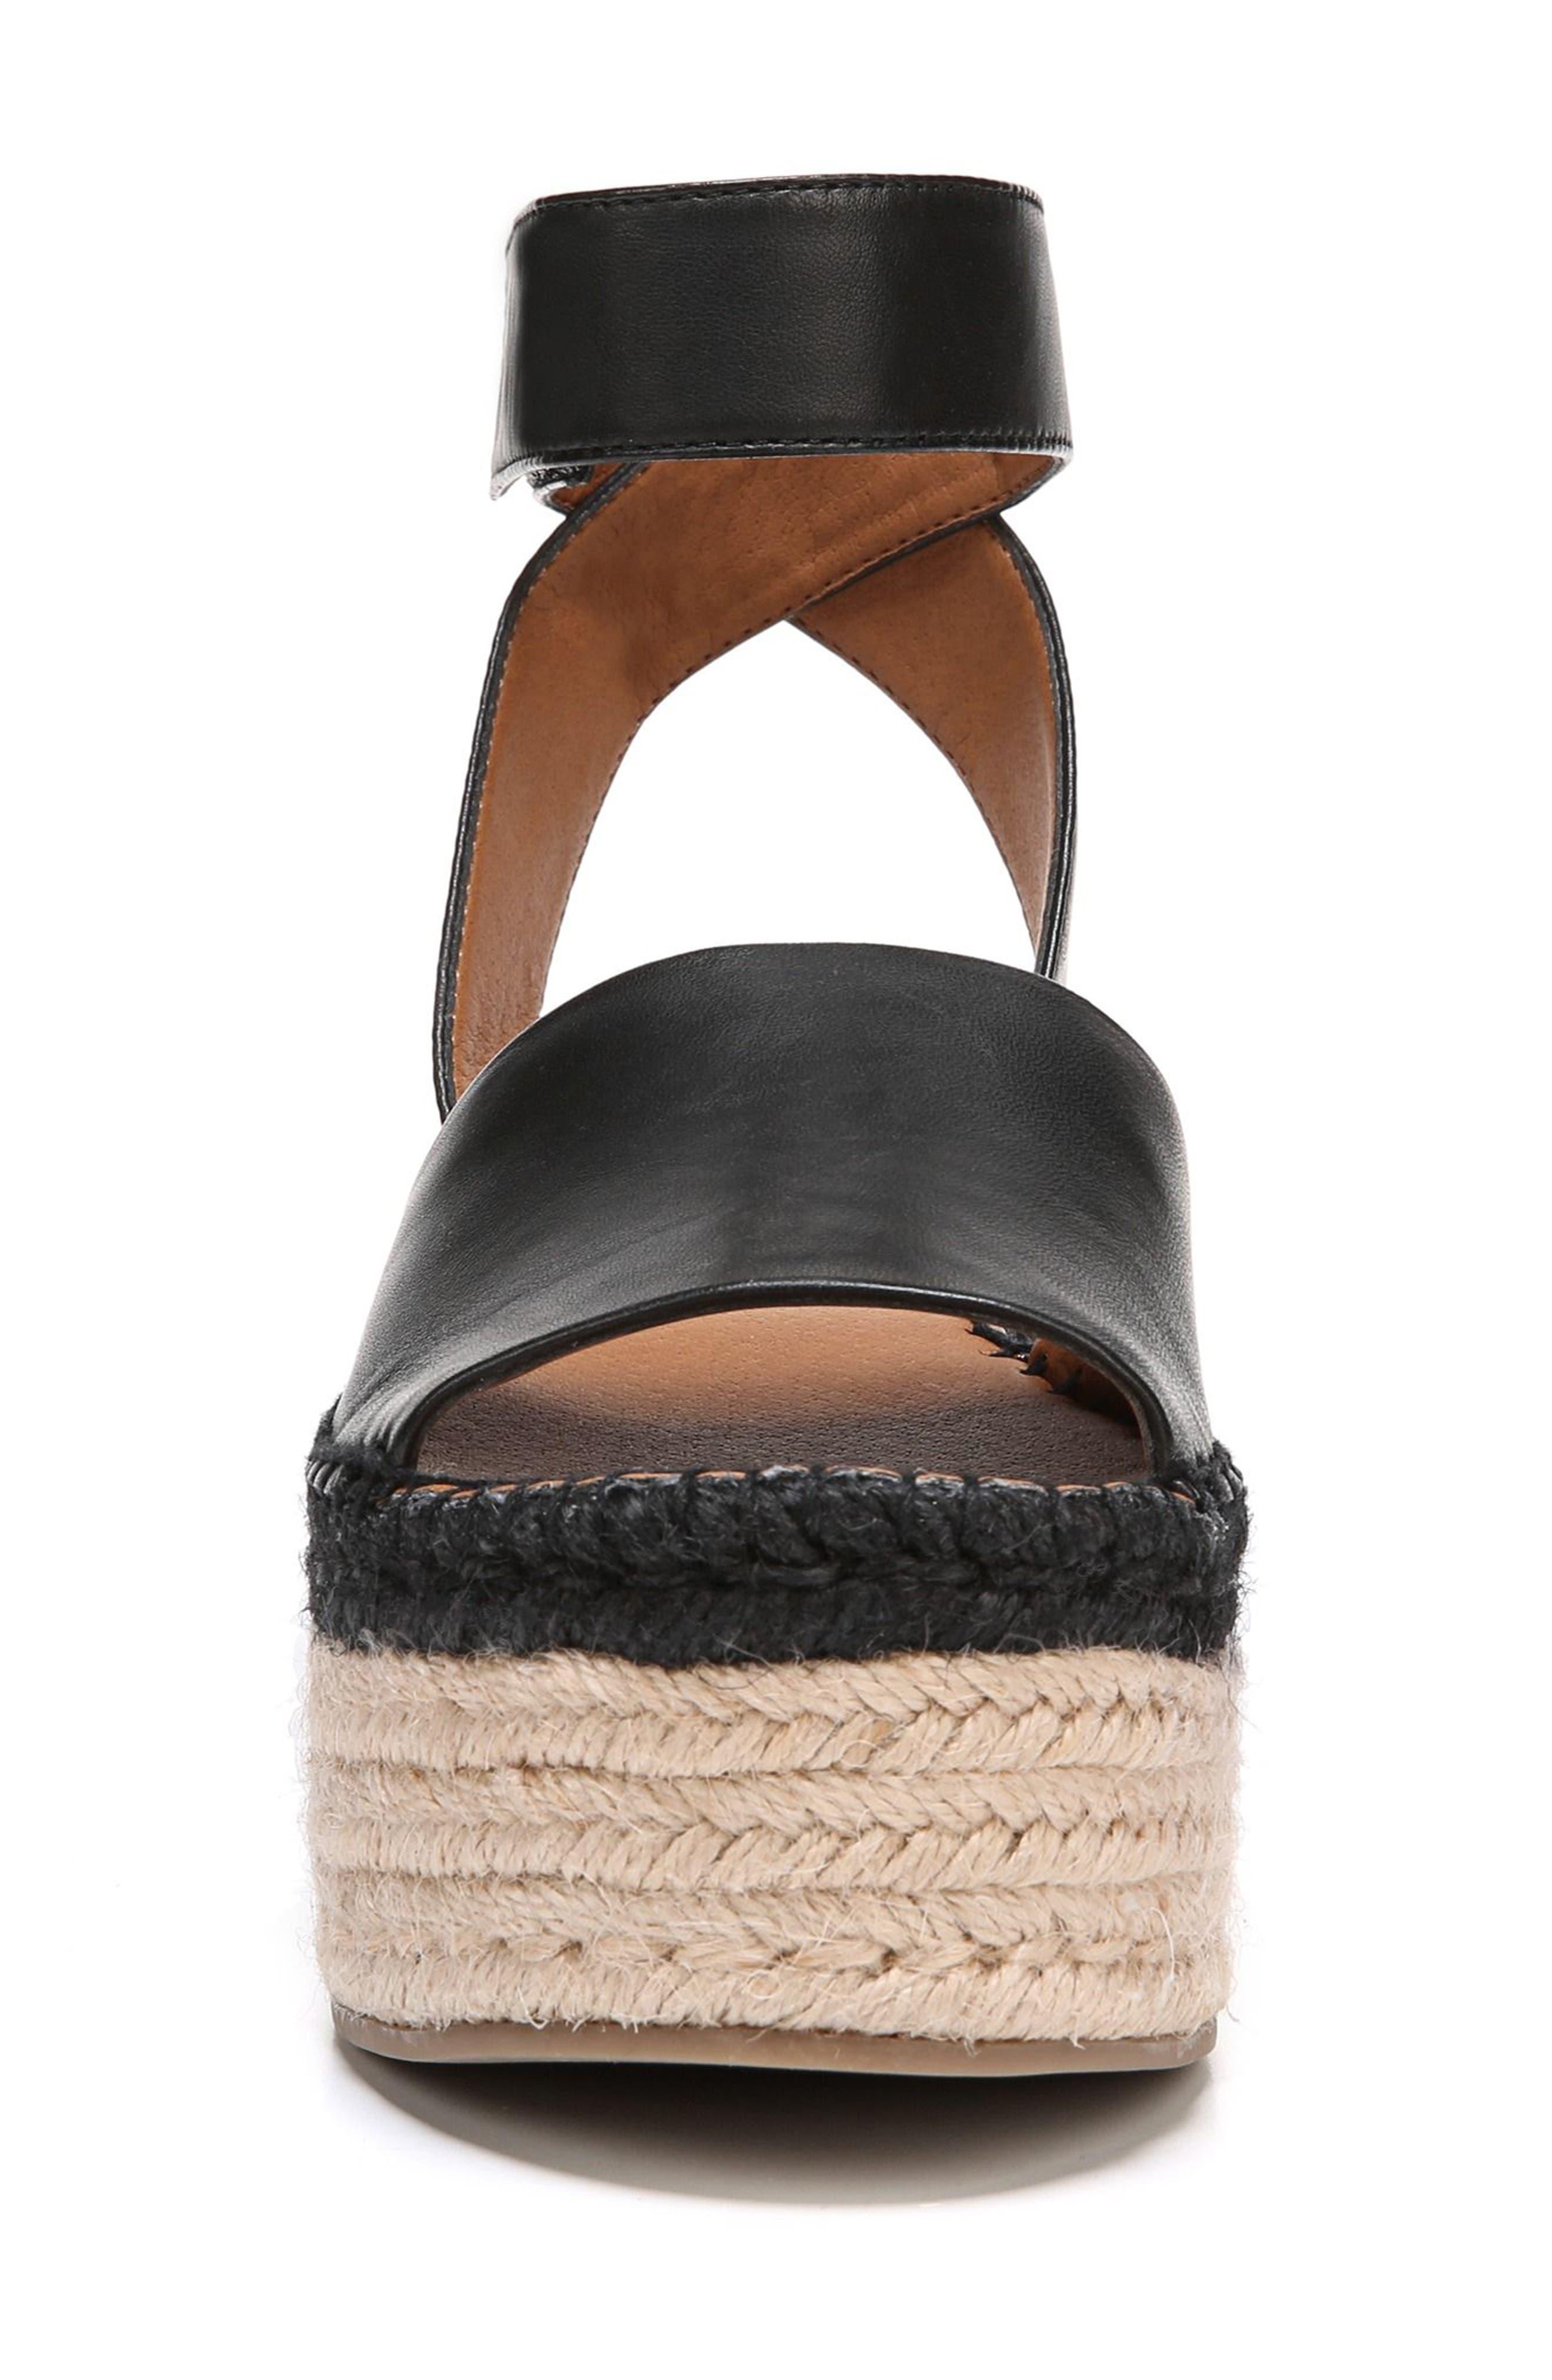 Maisi Platform Espadrille Sandal,                             Alternate thumbnail 4, color,                             BLACK LEATHER